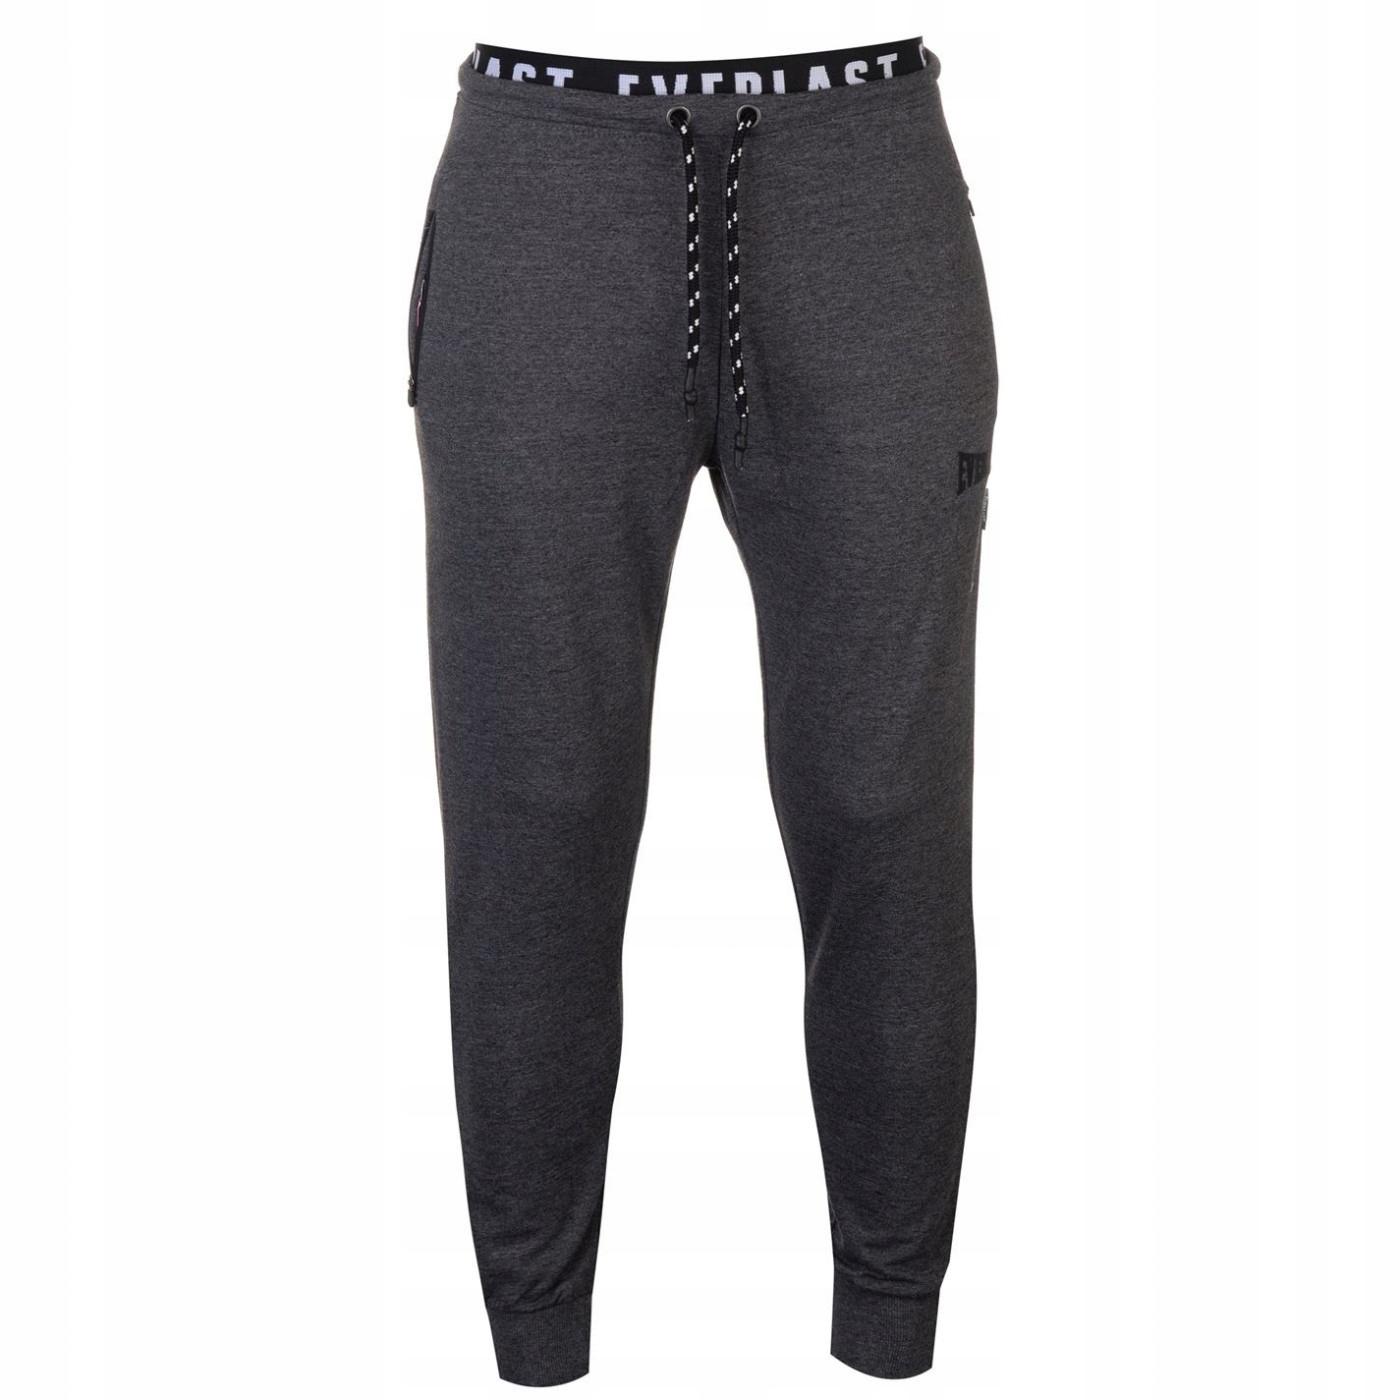 Everlast Jacquard Jogging spodnie dresowe XL